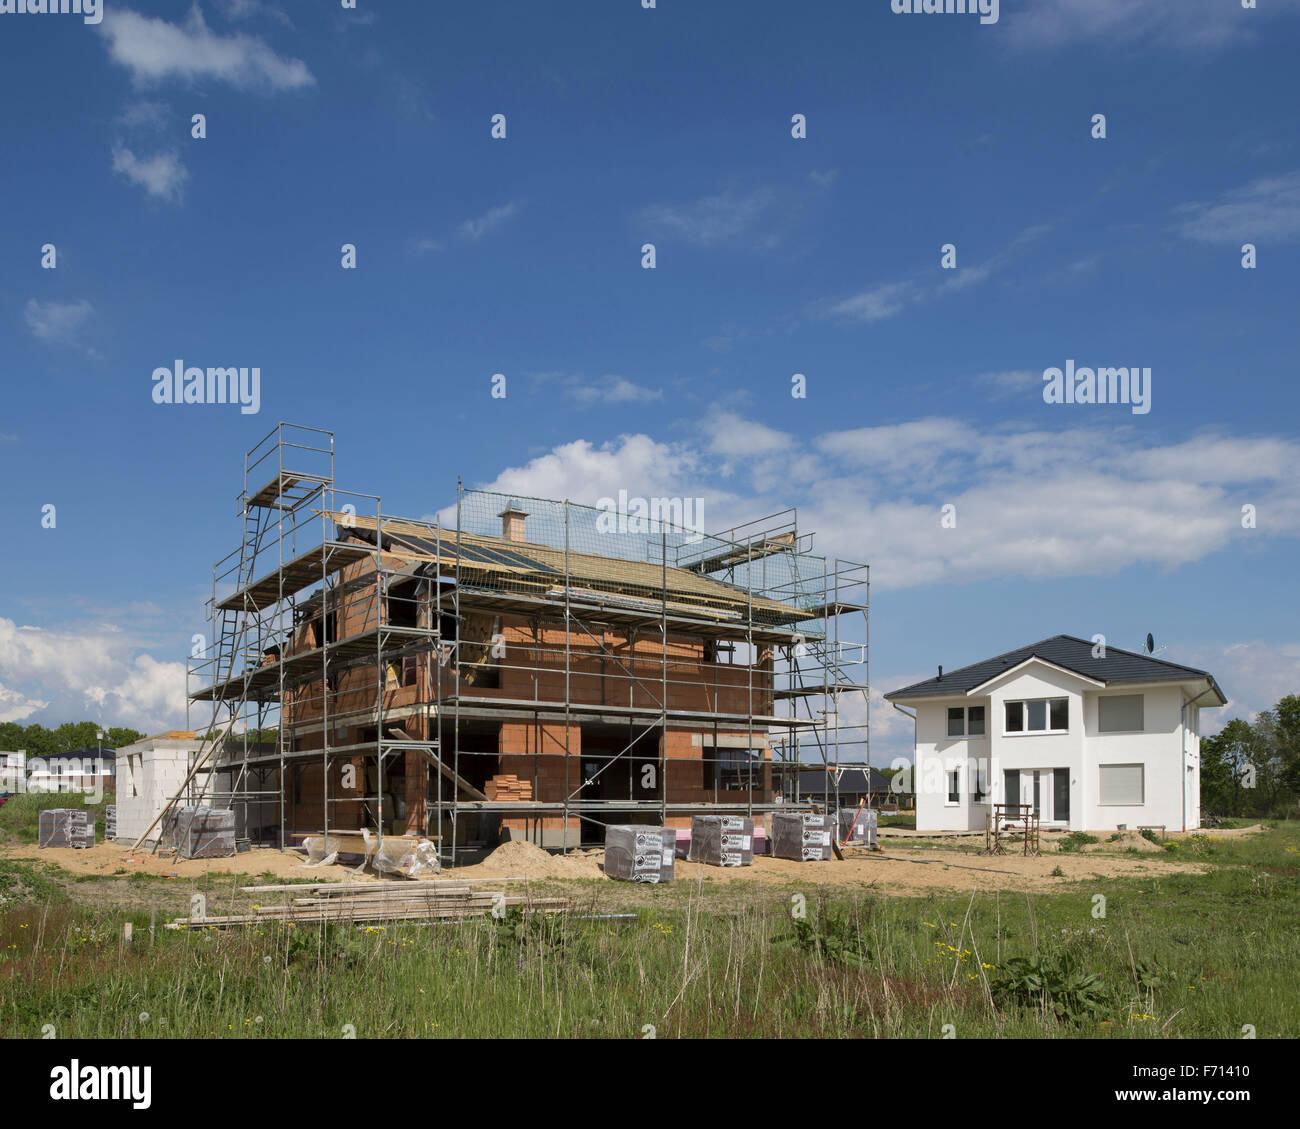 Housing construction, new housing estate, Lower Saxony, Germany - Stock Image